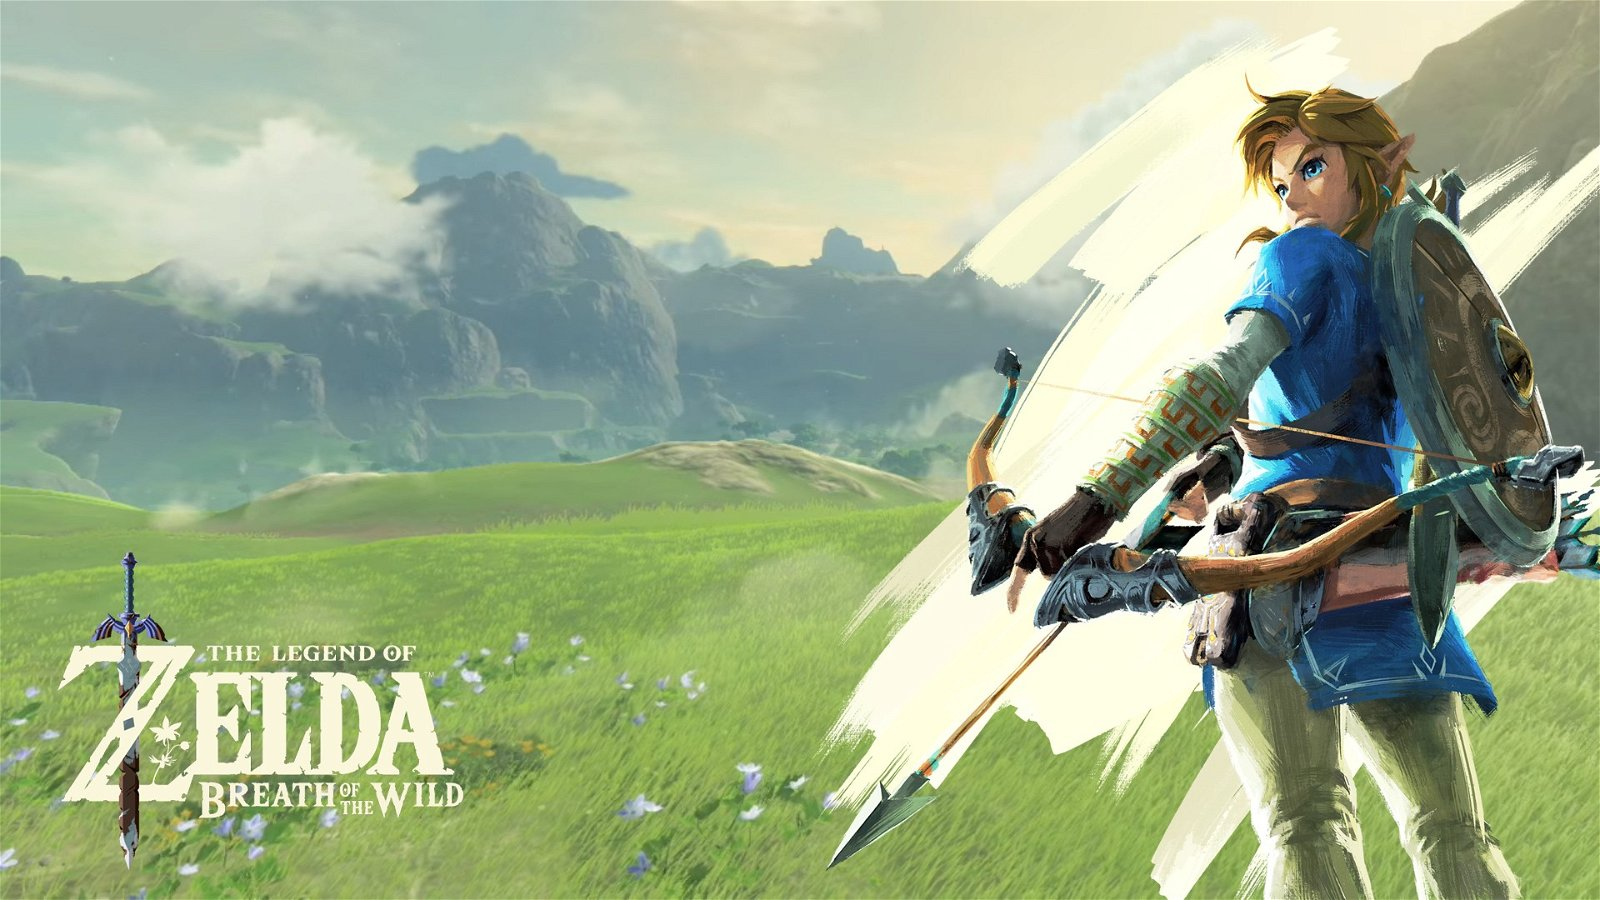 The Legend of Zelda: Breath of the Wild comparte su Making of